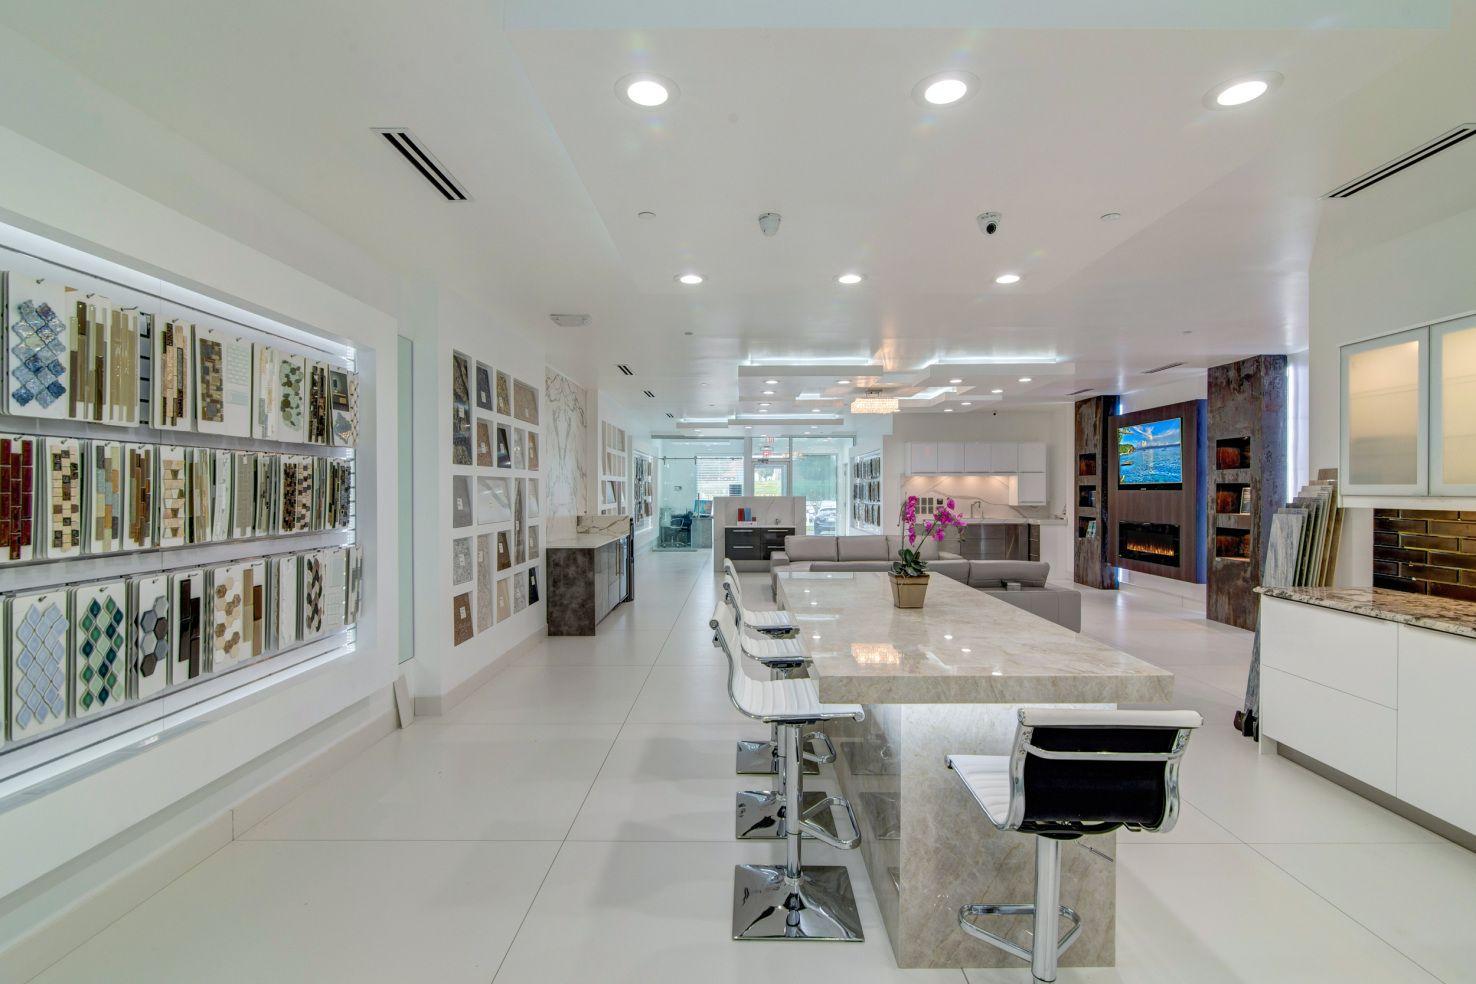 2018 Granite Countertops Chantilly Va   Corner Kitchen Cupboard Ideas Check  More At Http:/